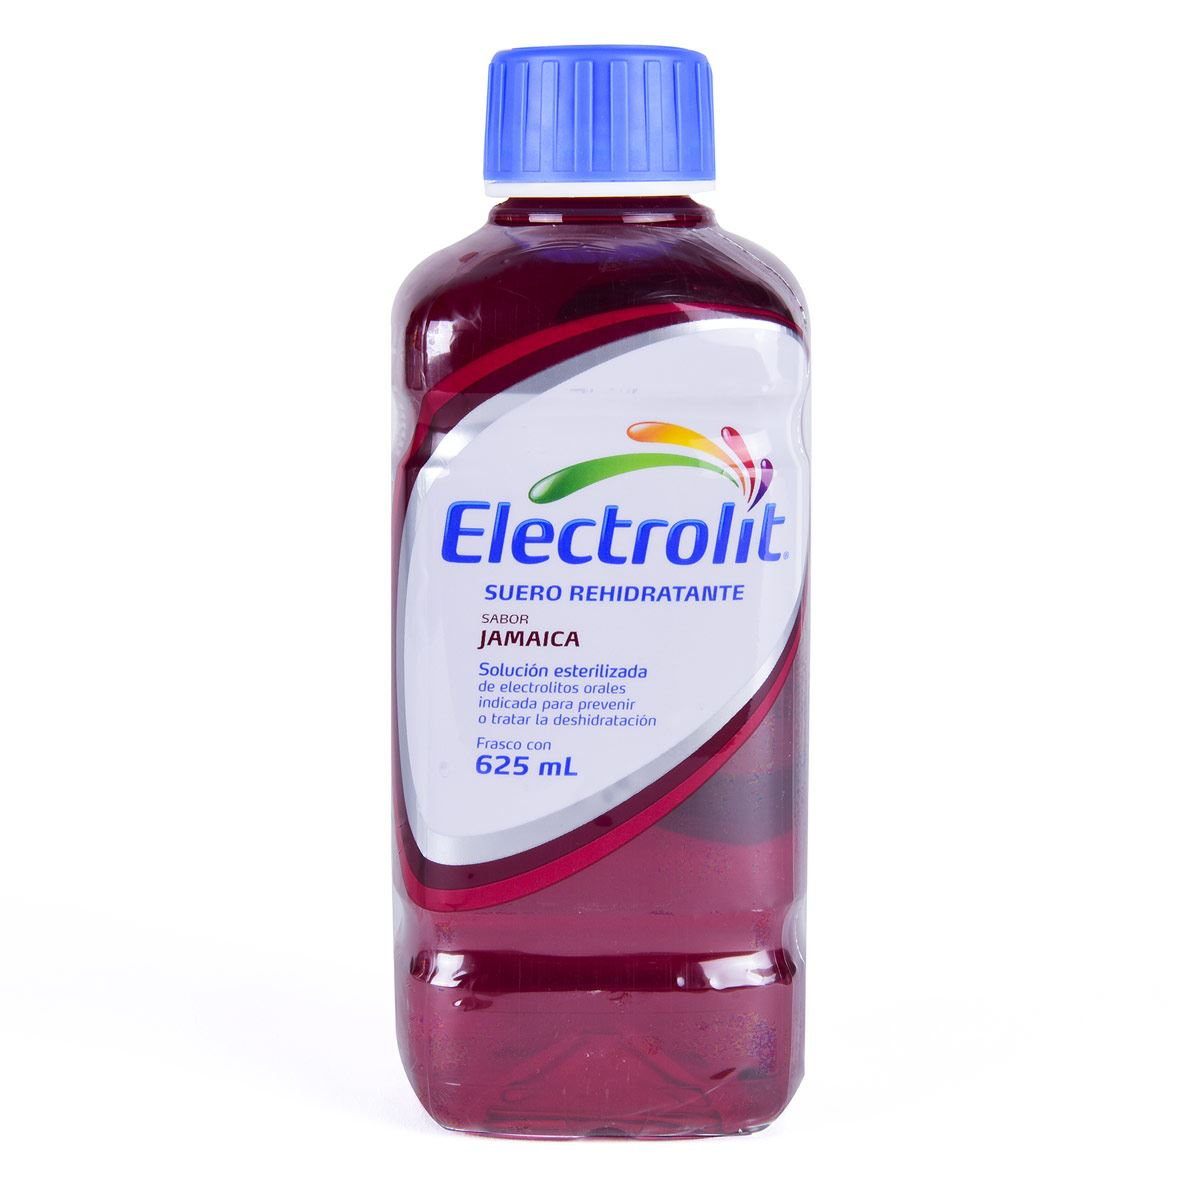 Electrolit Sabor Jamaica